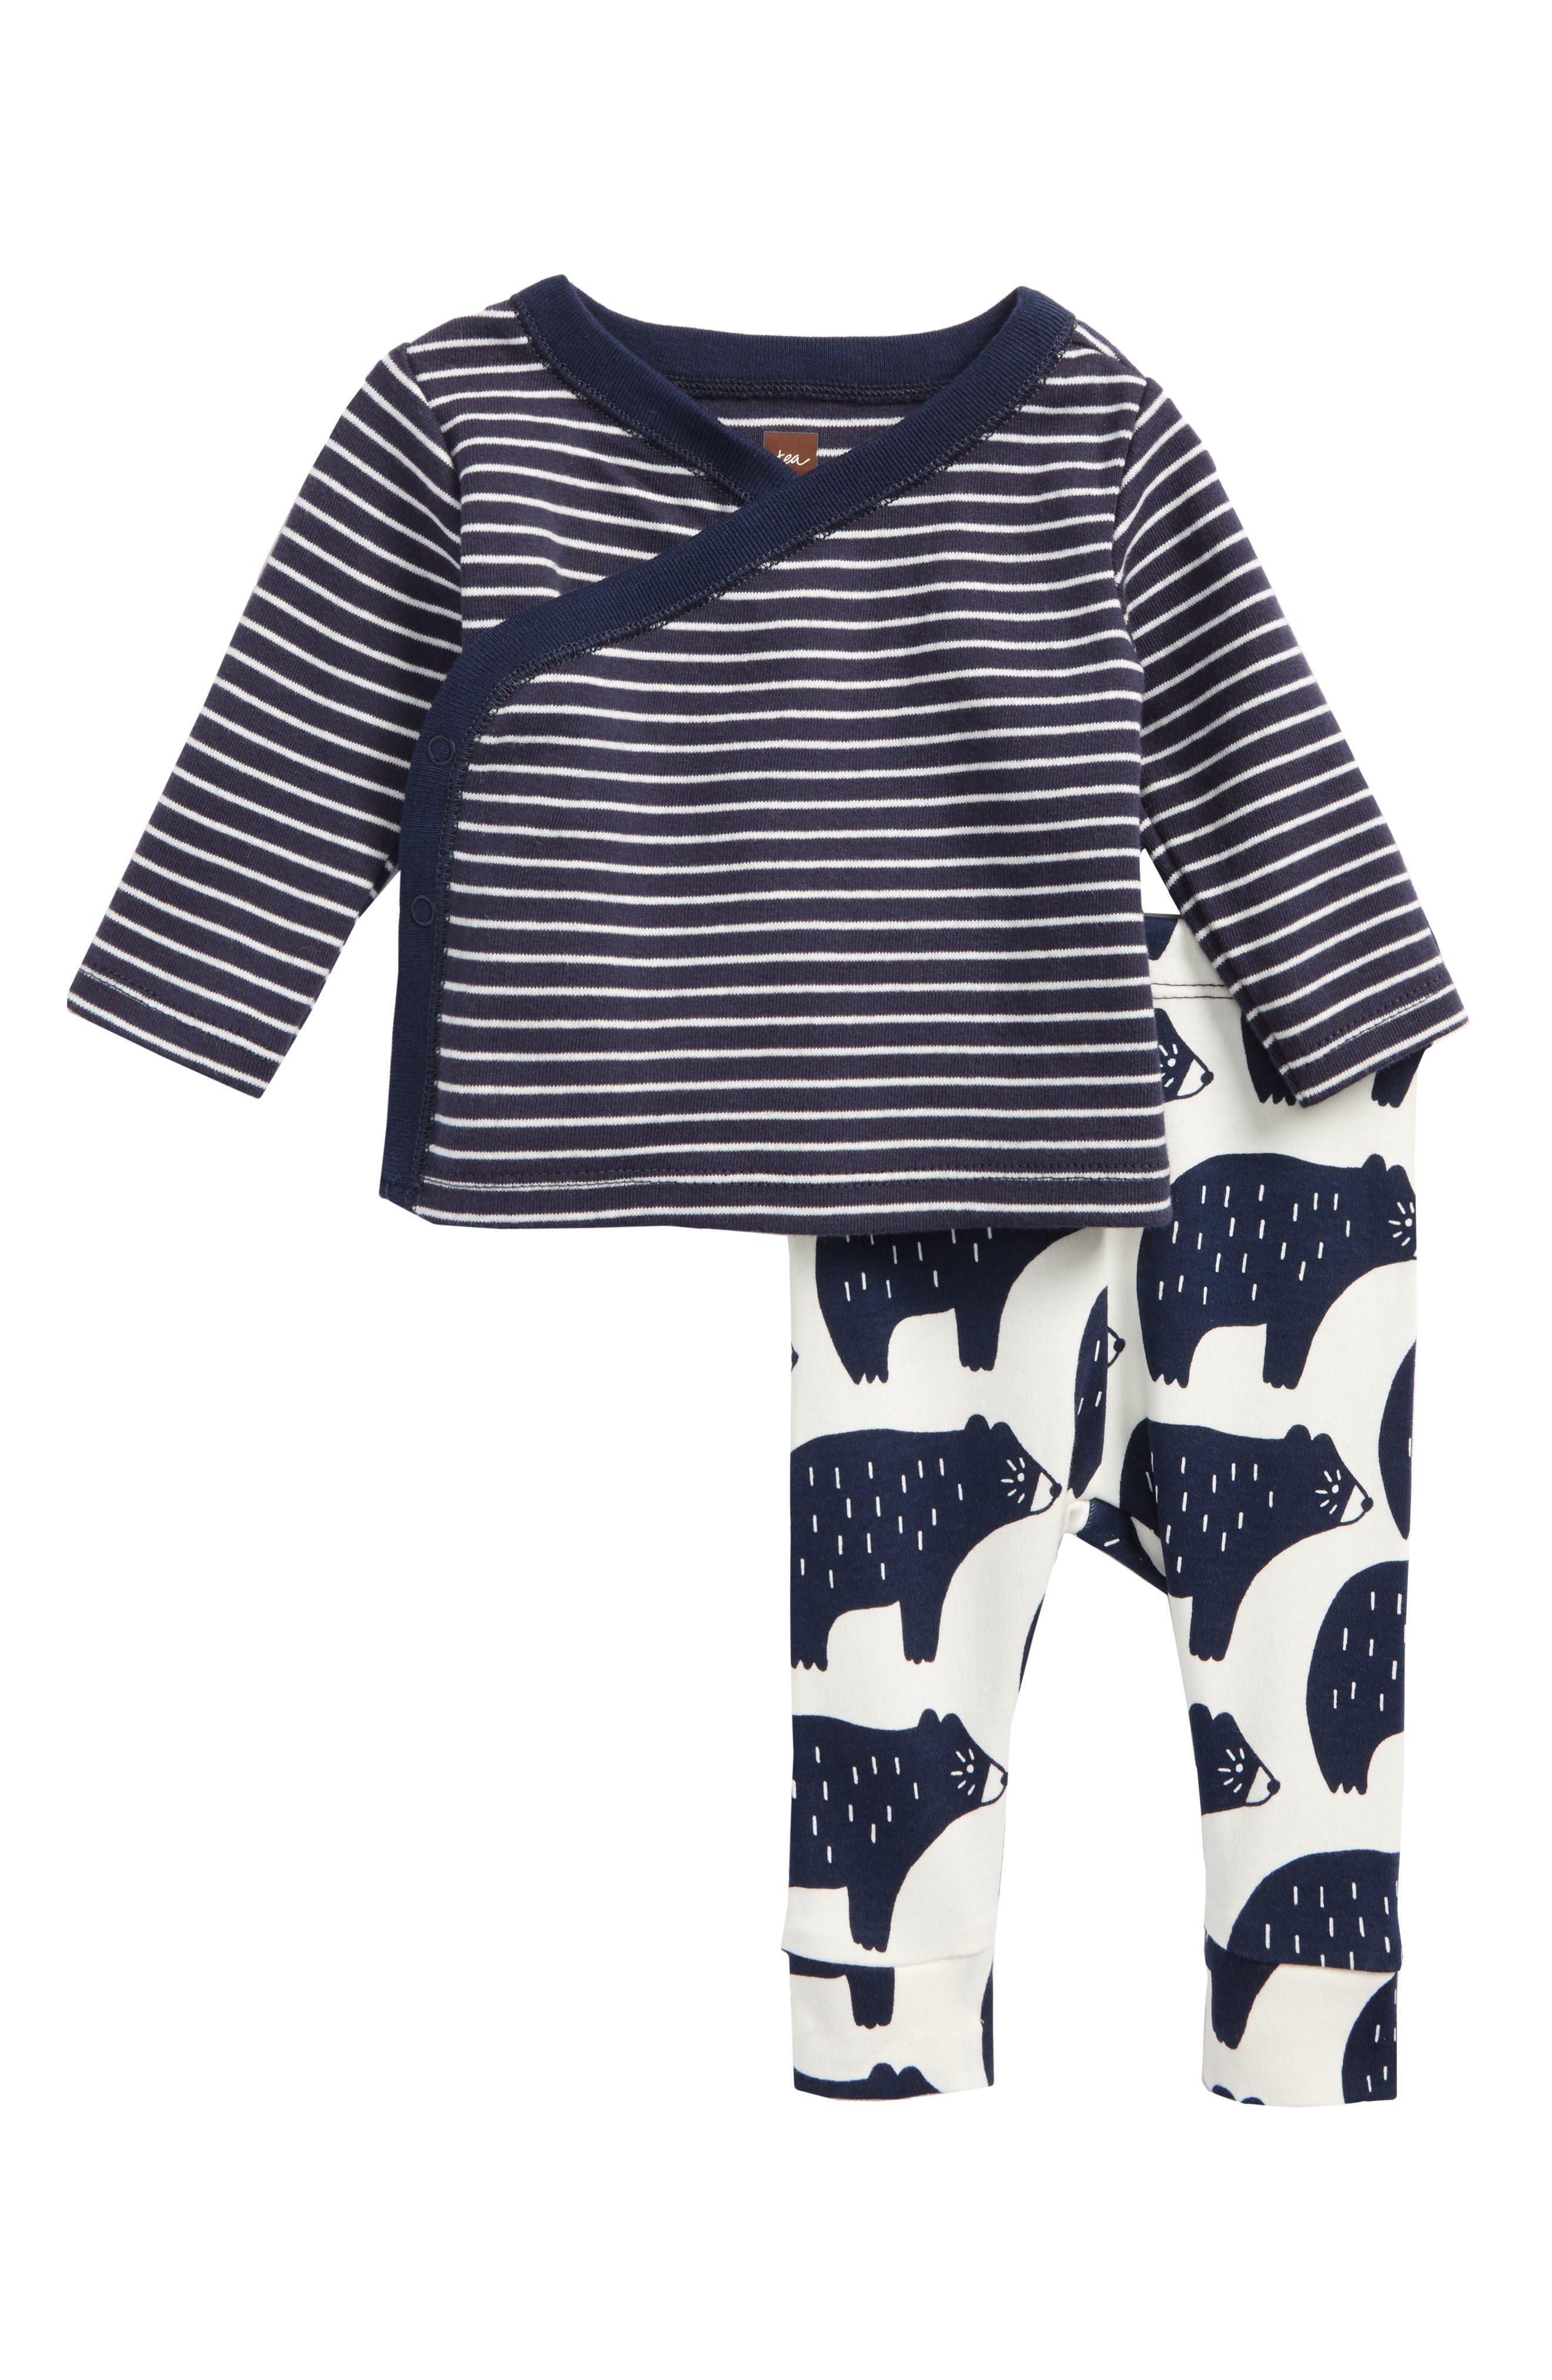 Main Image - Tea Collection Wrap Tunic & Pants Set (Baby Boys)